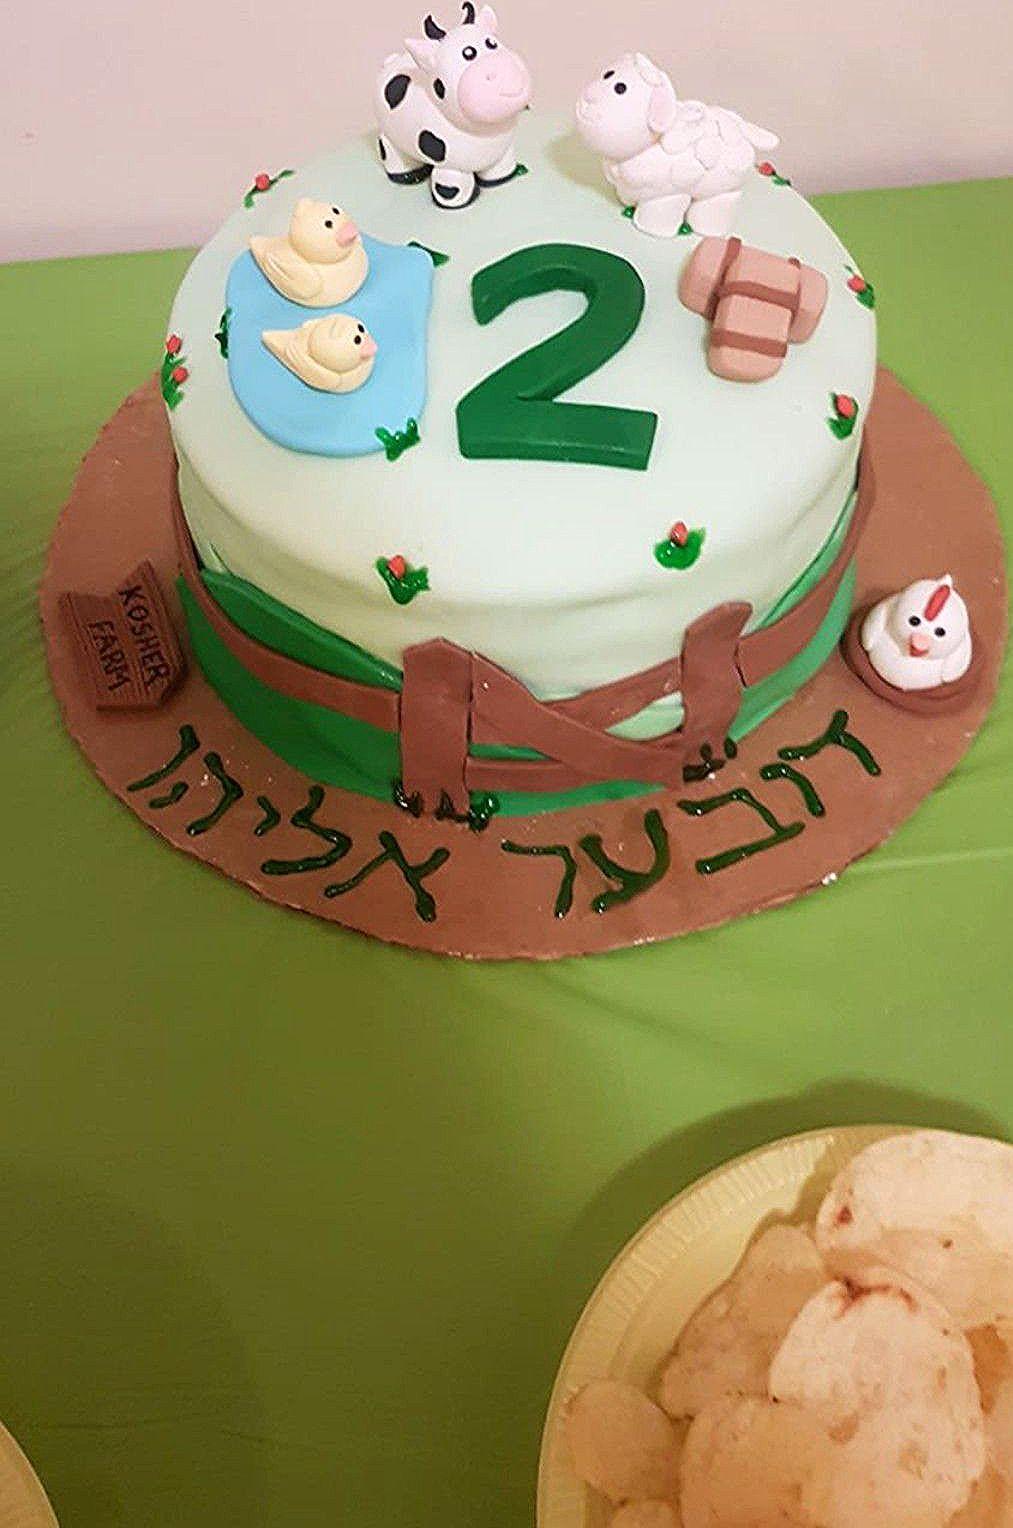 Amazing Kosher Farm Cake In 2020 Farm Cake Cake Kosher Personalised Birthday Cards Arneslily Jamesorg